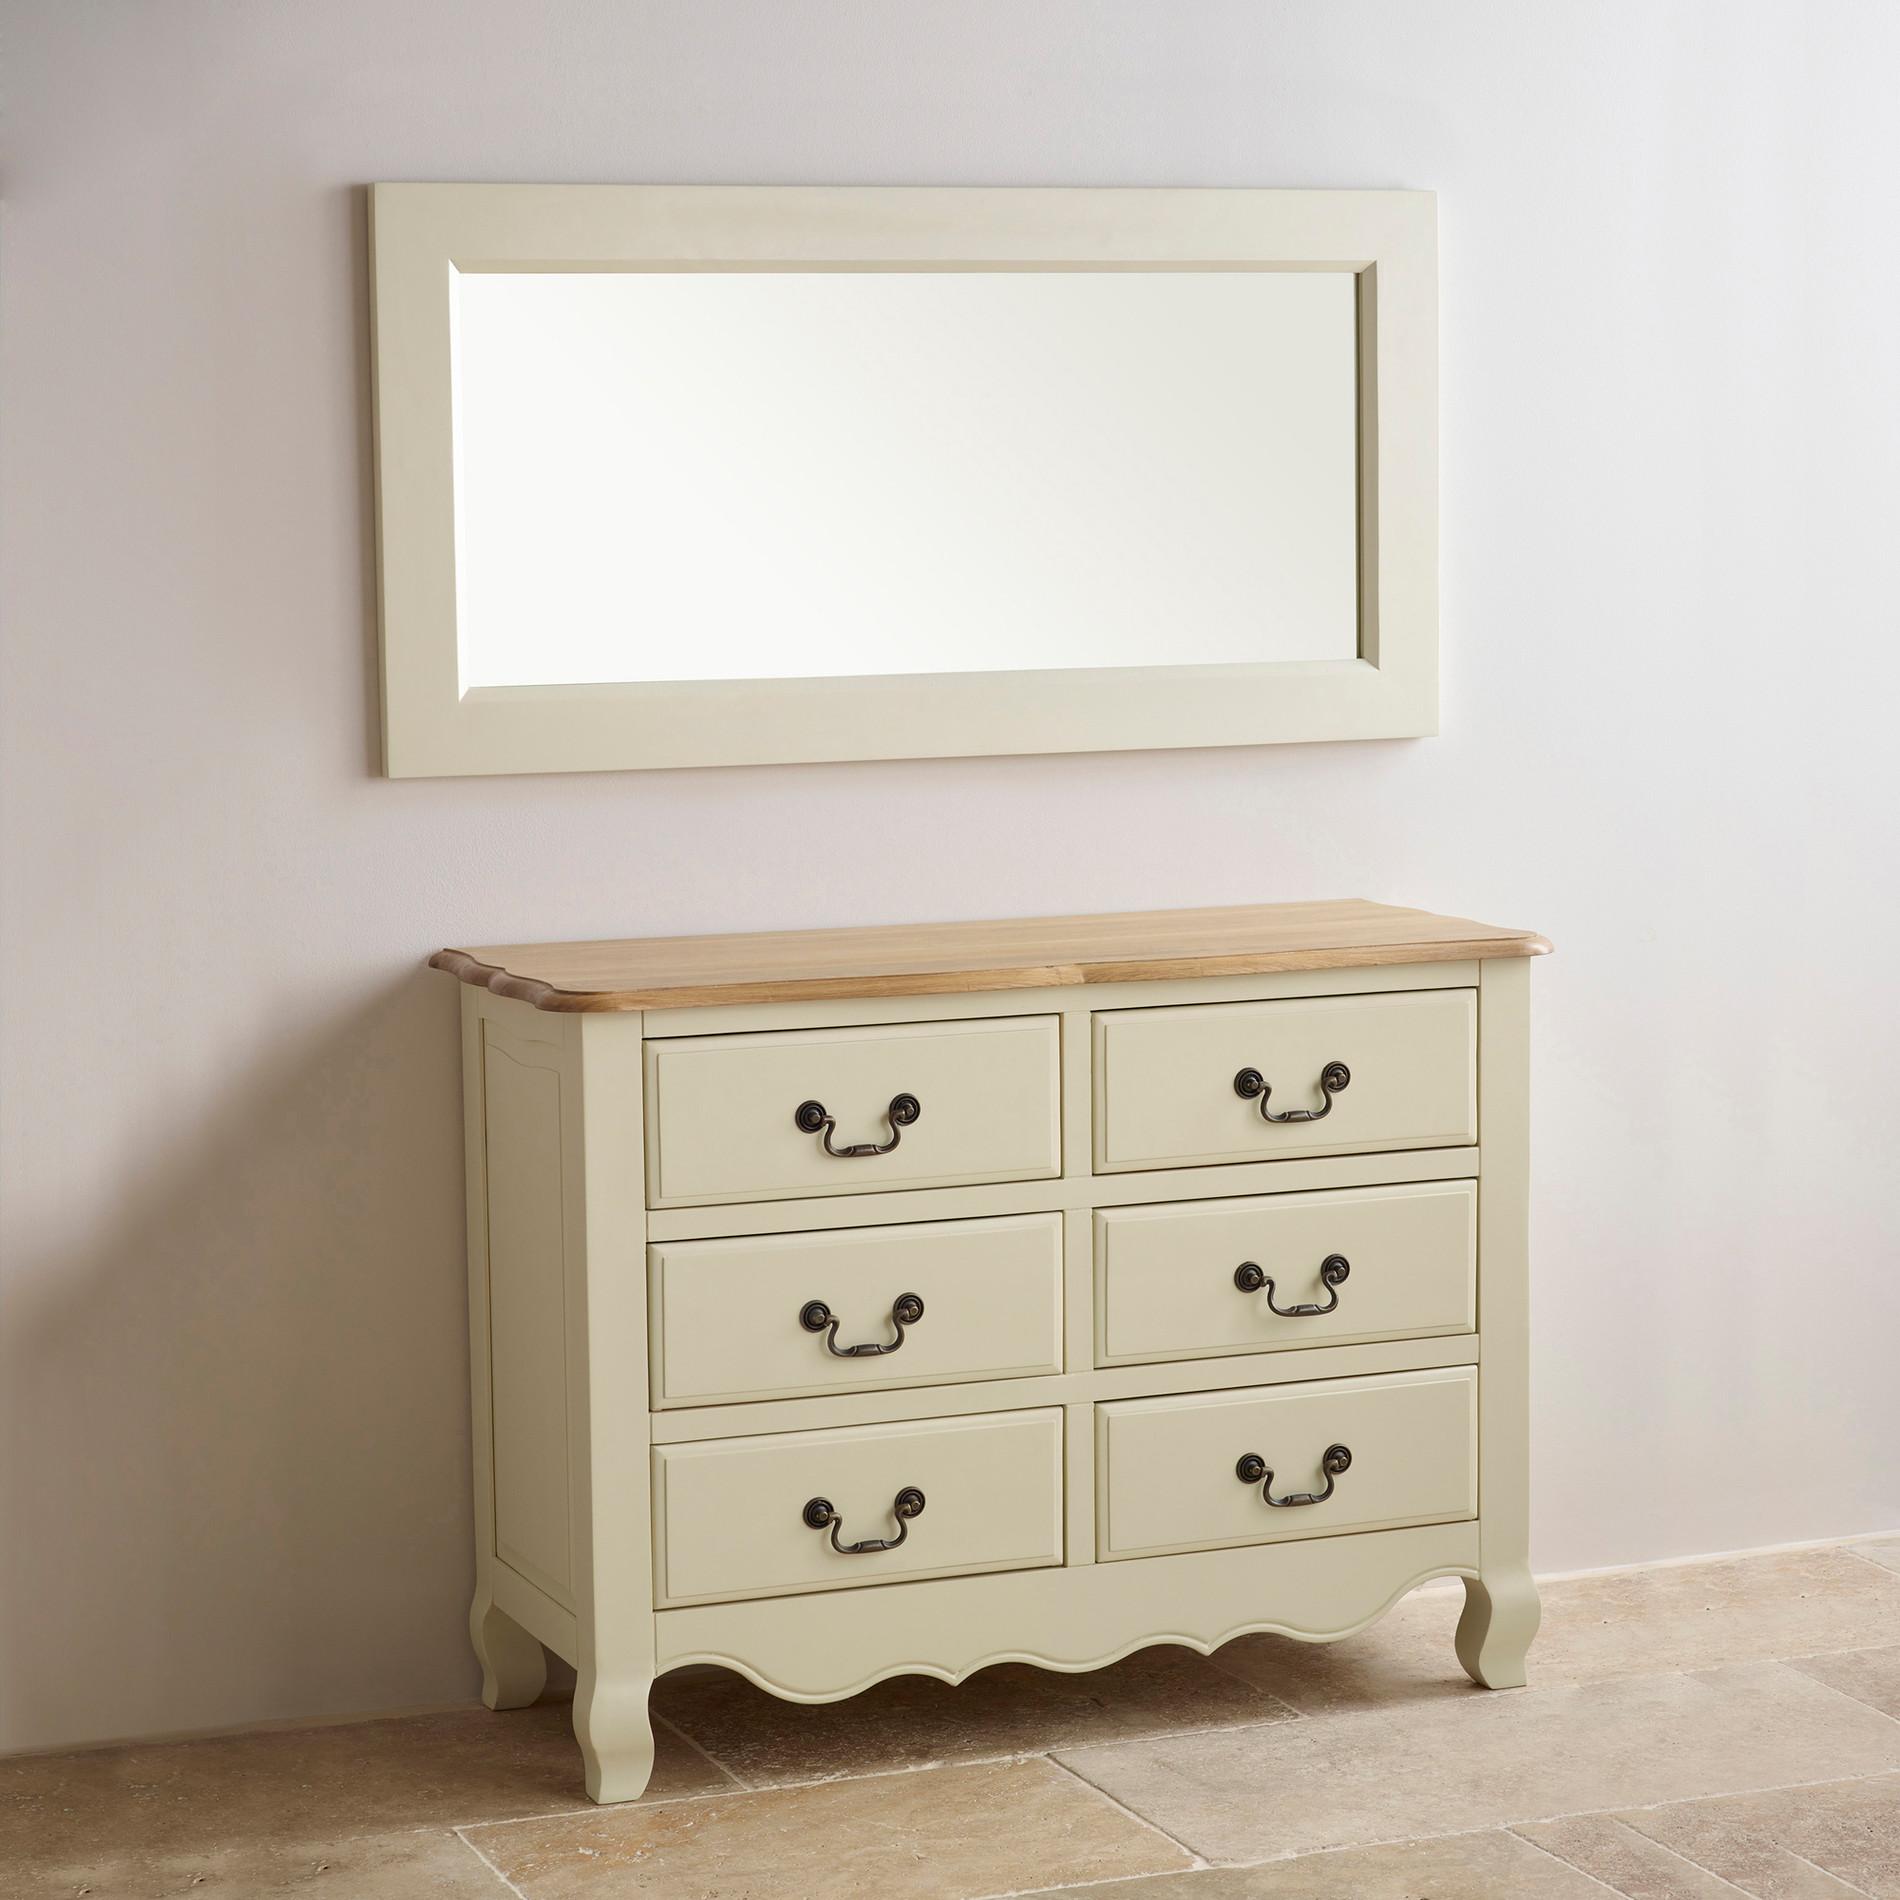 Oak And Cream Bedroom Furniture The Bella Painted Bedroom Range Solid Oak And Acacia Bedroom